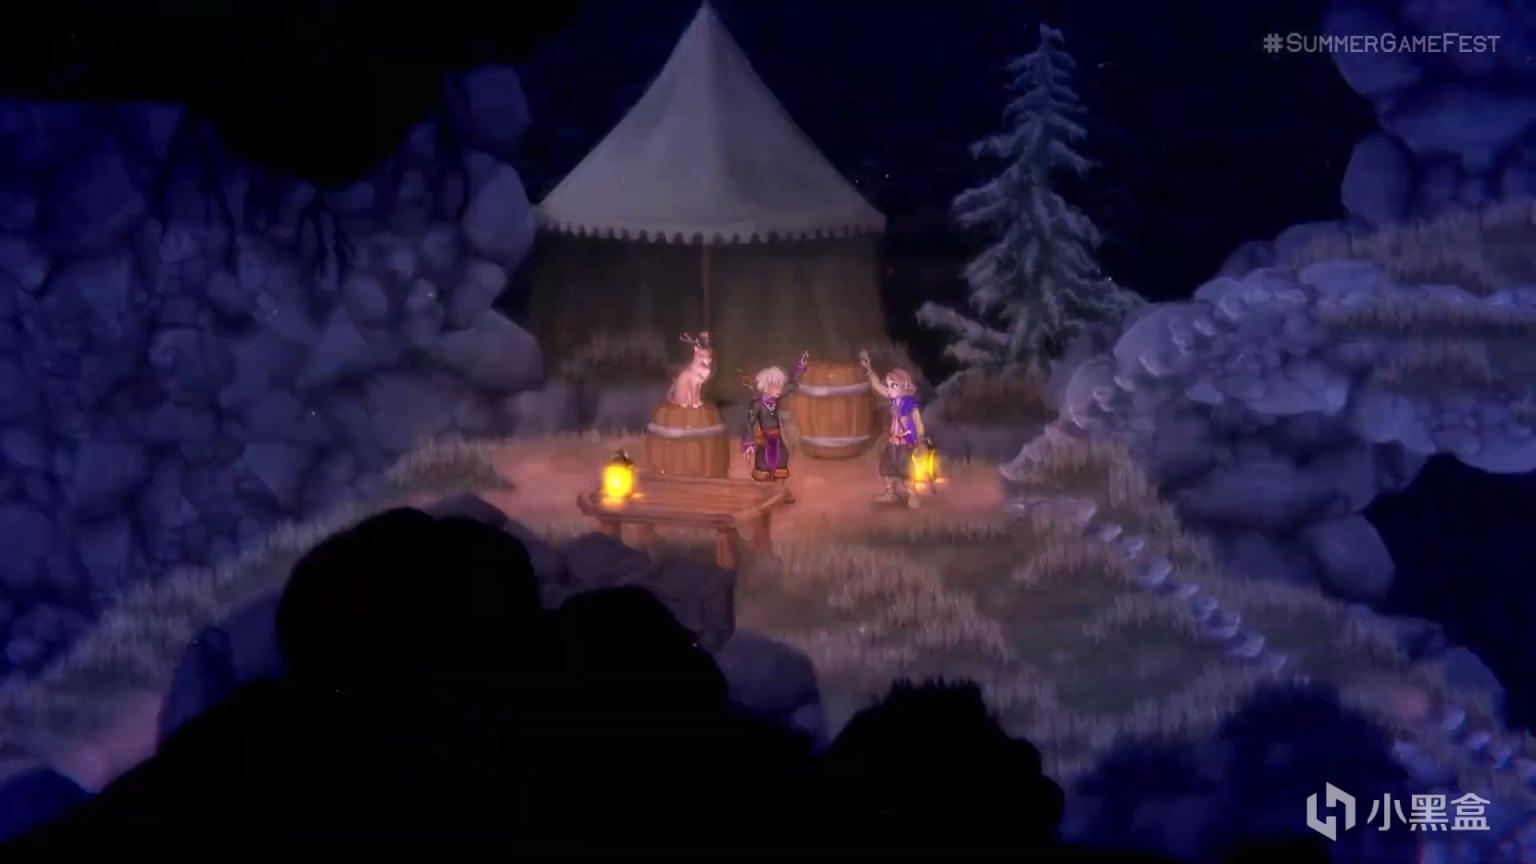 E3夏季游戏节:《盐与避难所》续作将于2022年登陆PS4/PS5平台